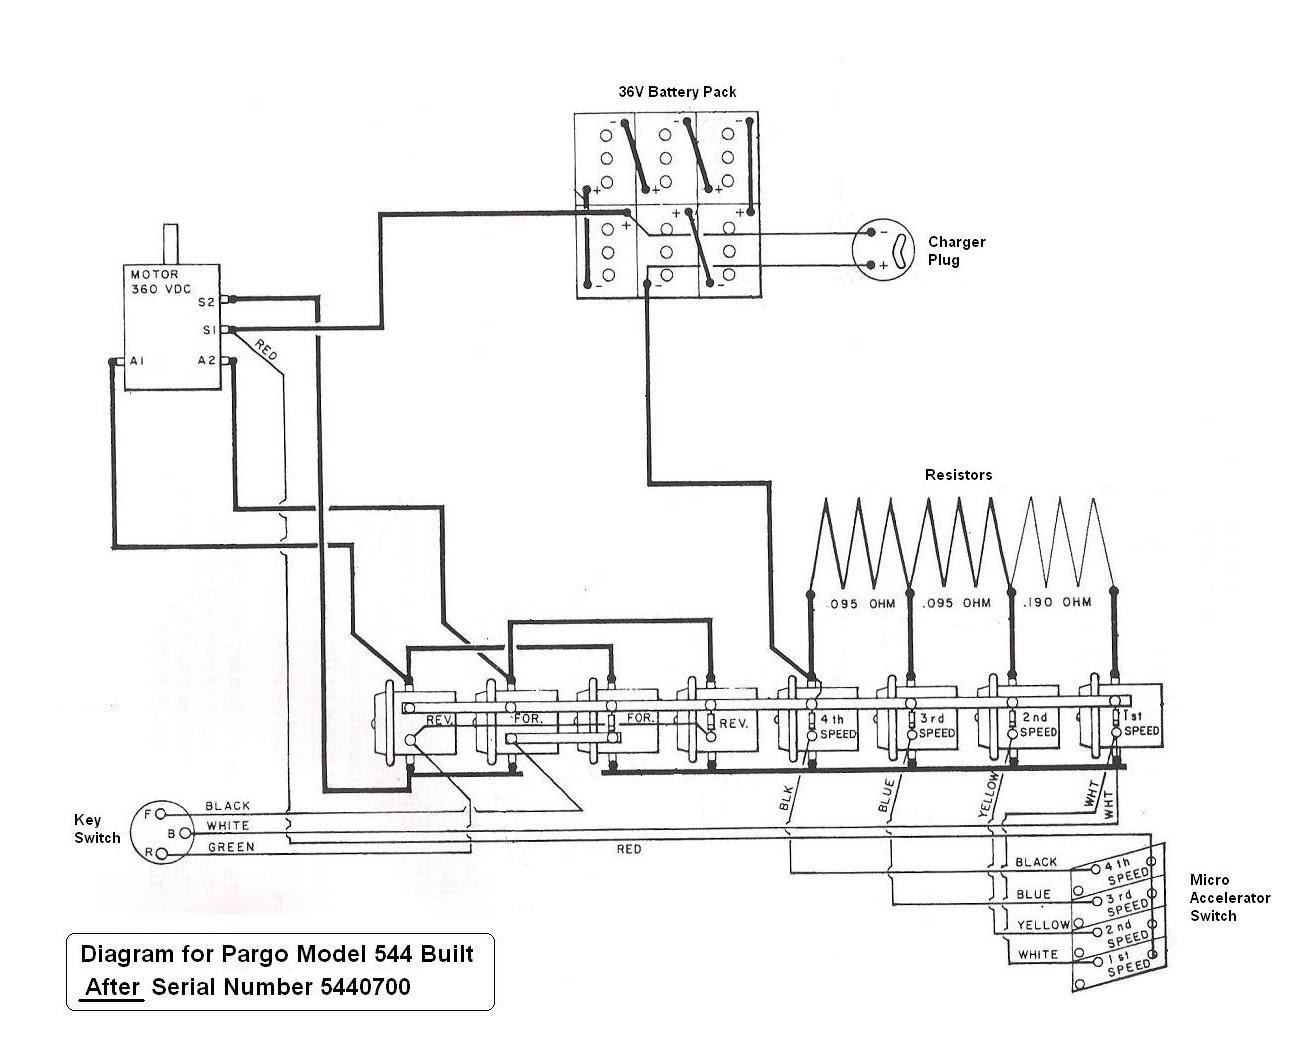 hight resolution of club car d model diagram